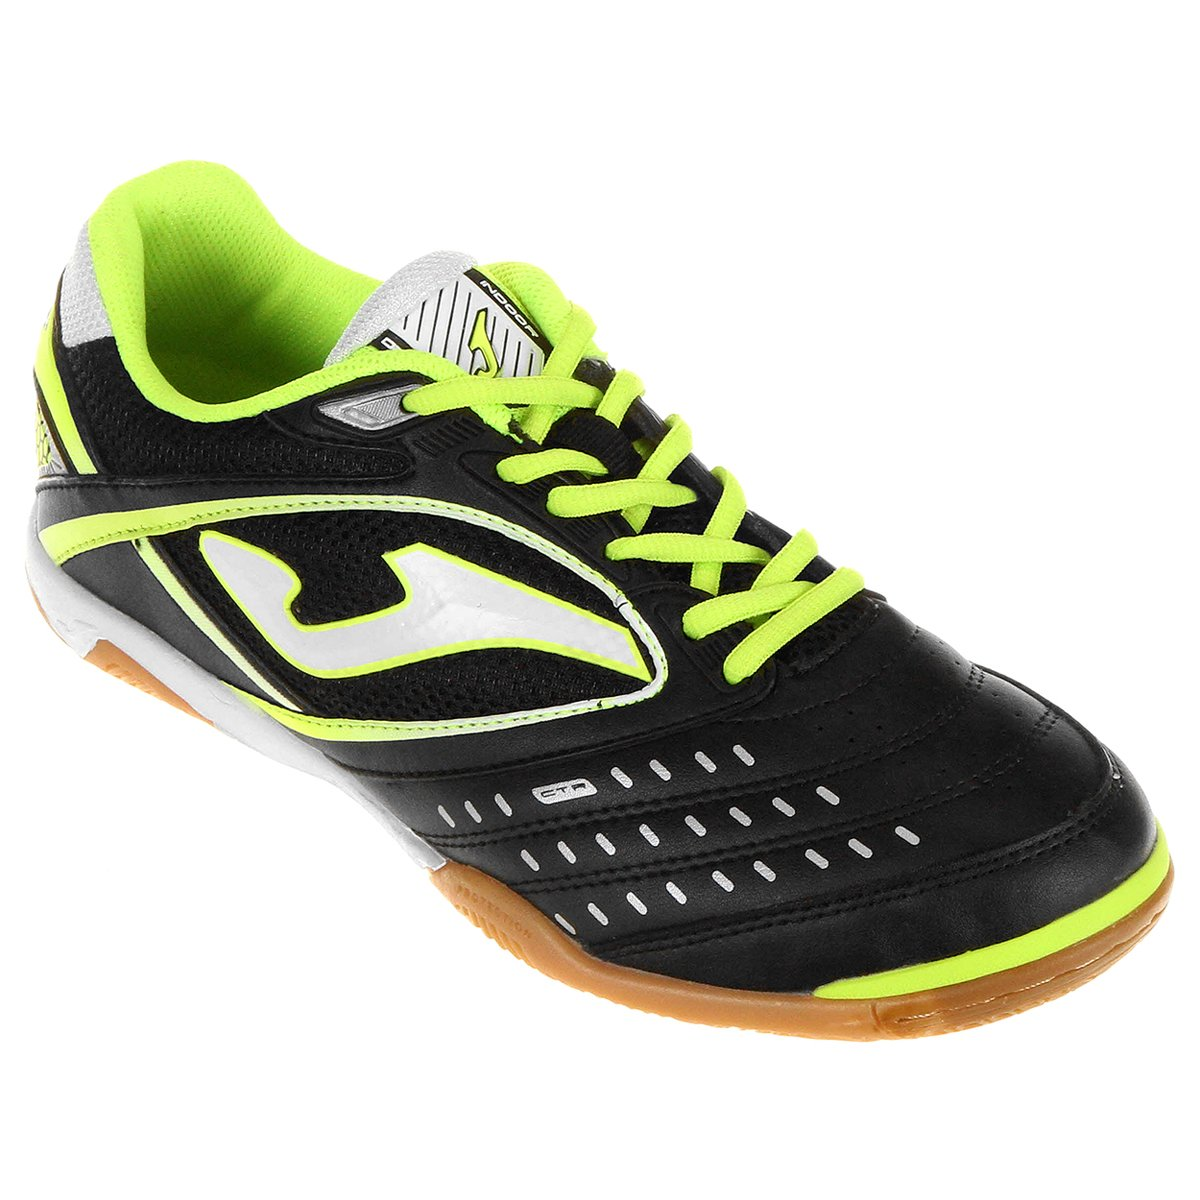 Chuteira Joma Dribling Futsal - Compre Agora  abec4a037dc0c